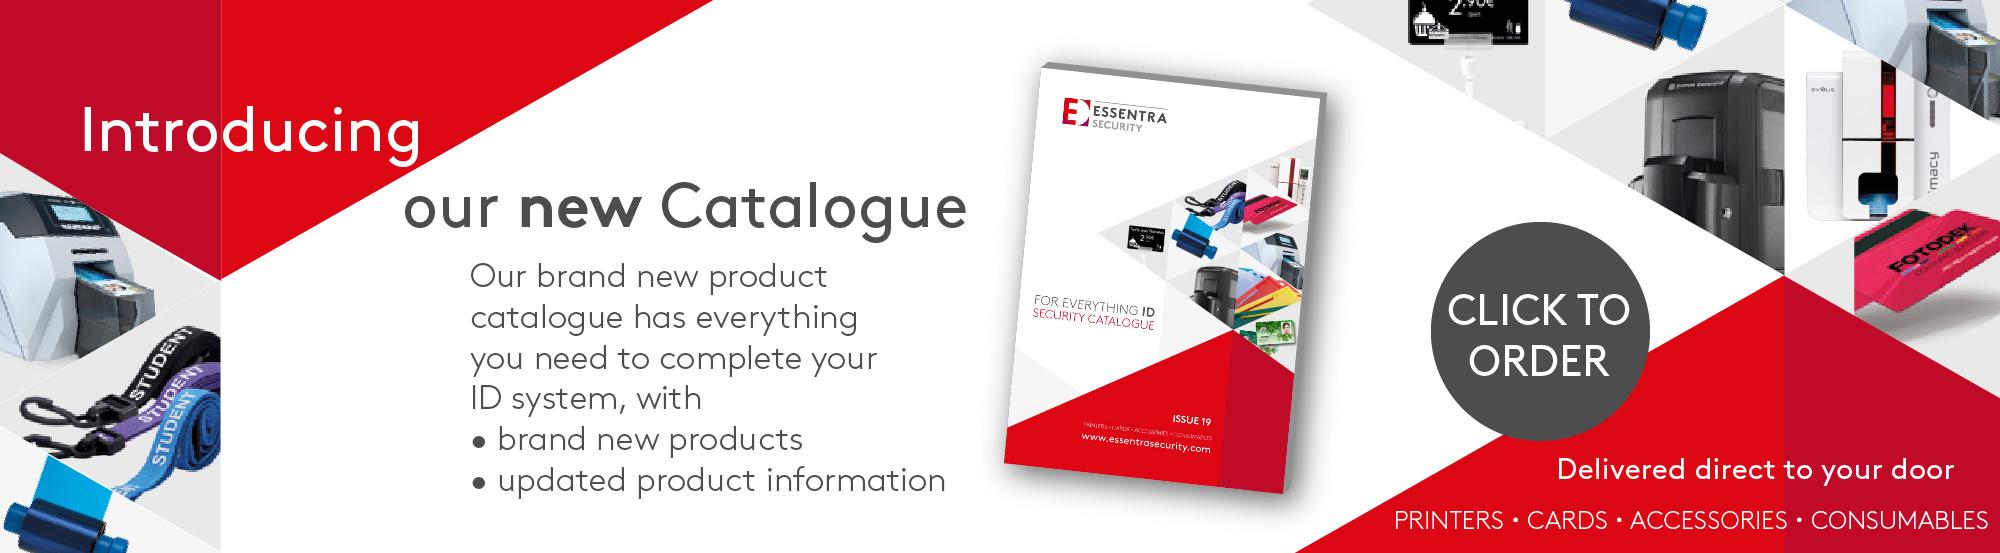 Essentra security catalogue banner